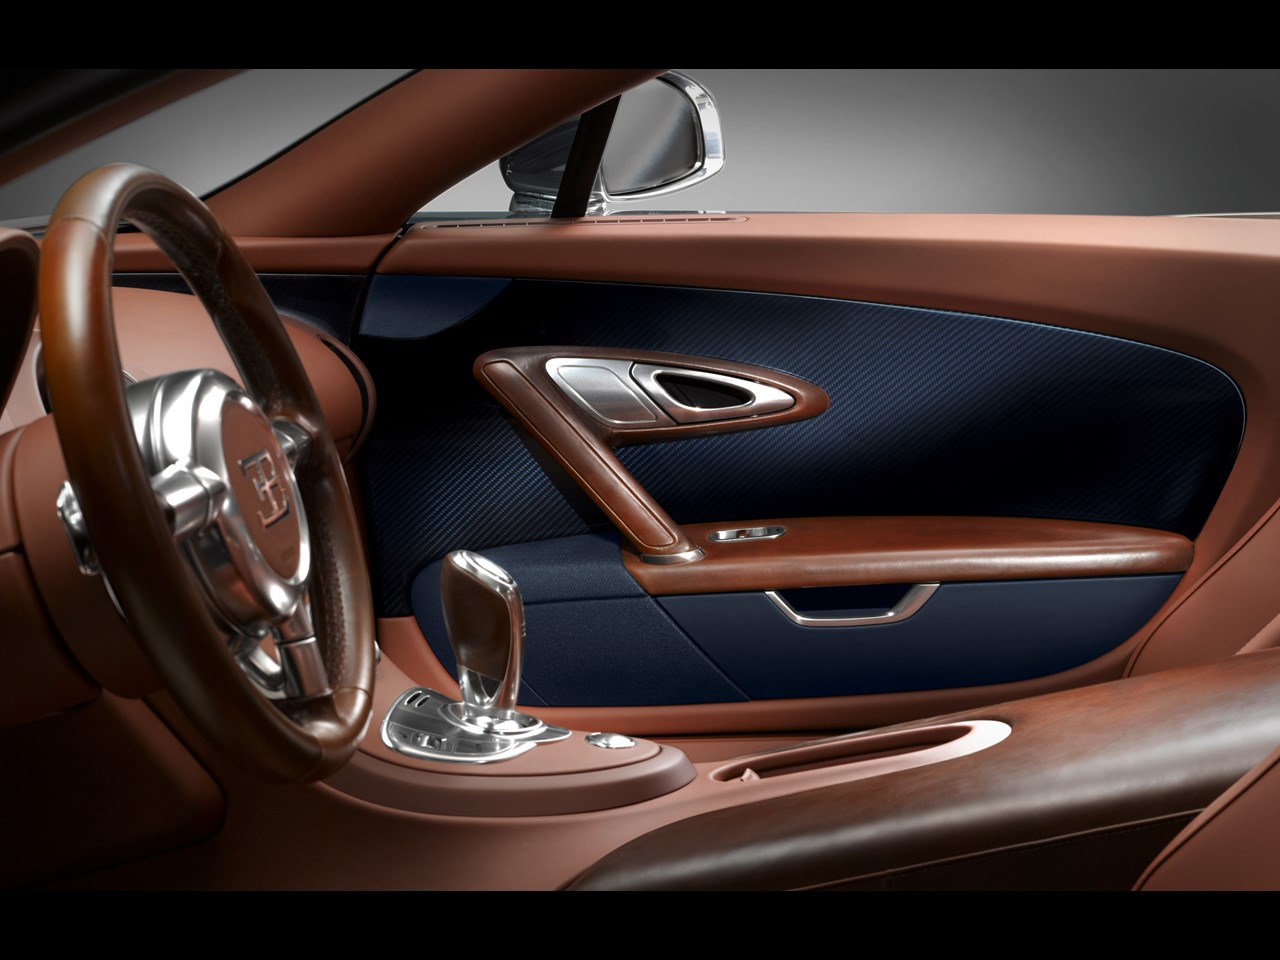 bugatti veyron 16 4 grand sport vitesse notoriousluxury. Black Bedroom Furniture Sets. Home Design Ideas